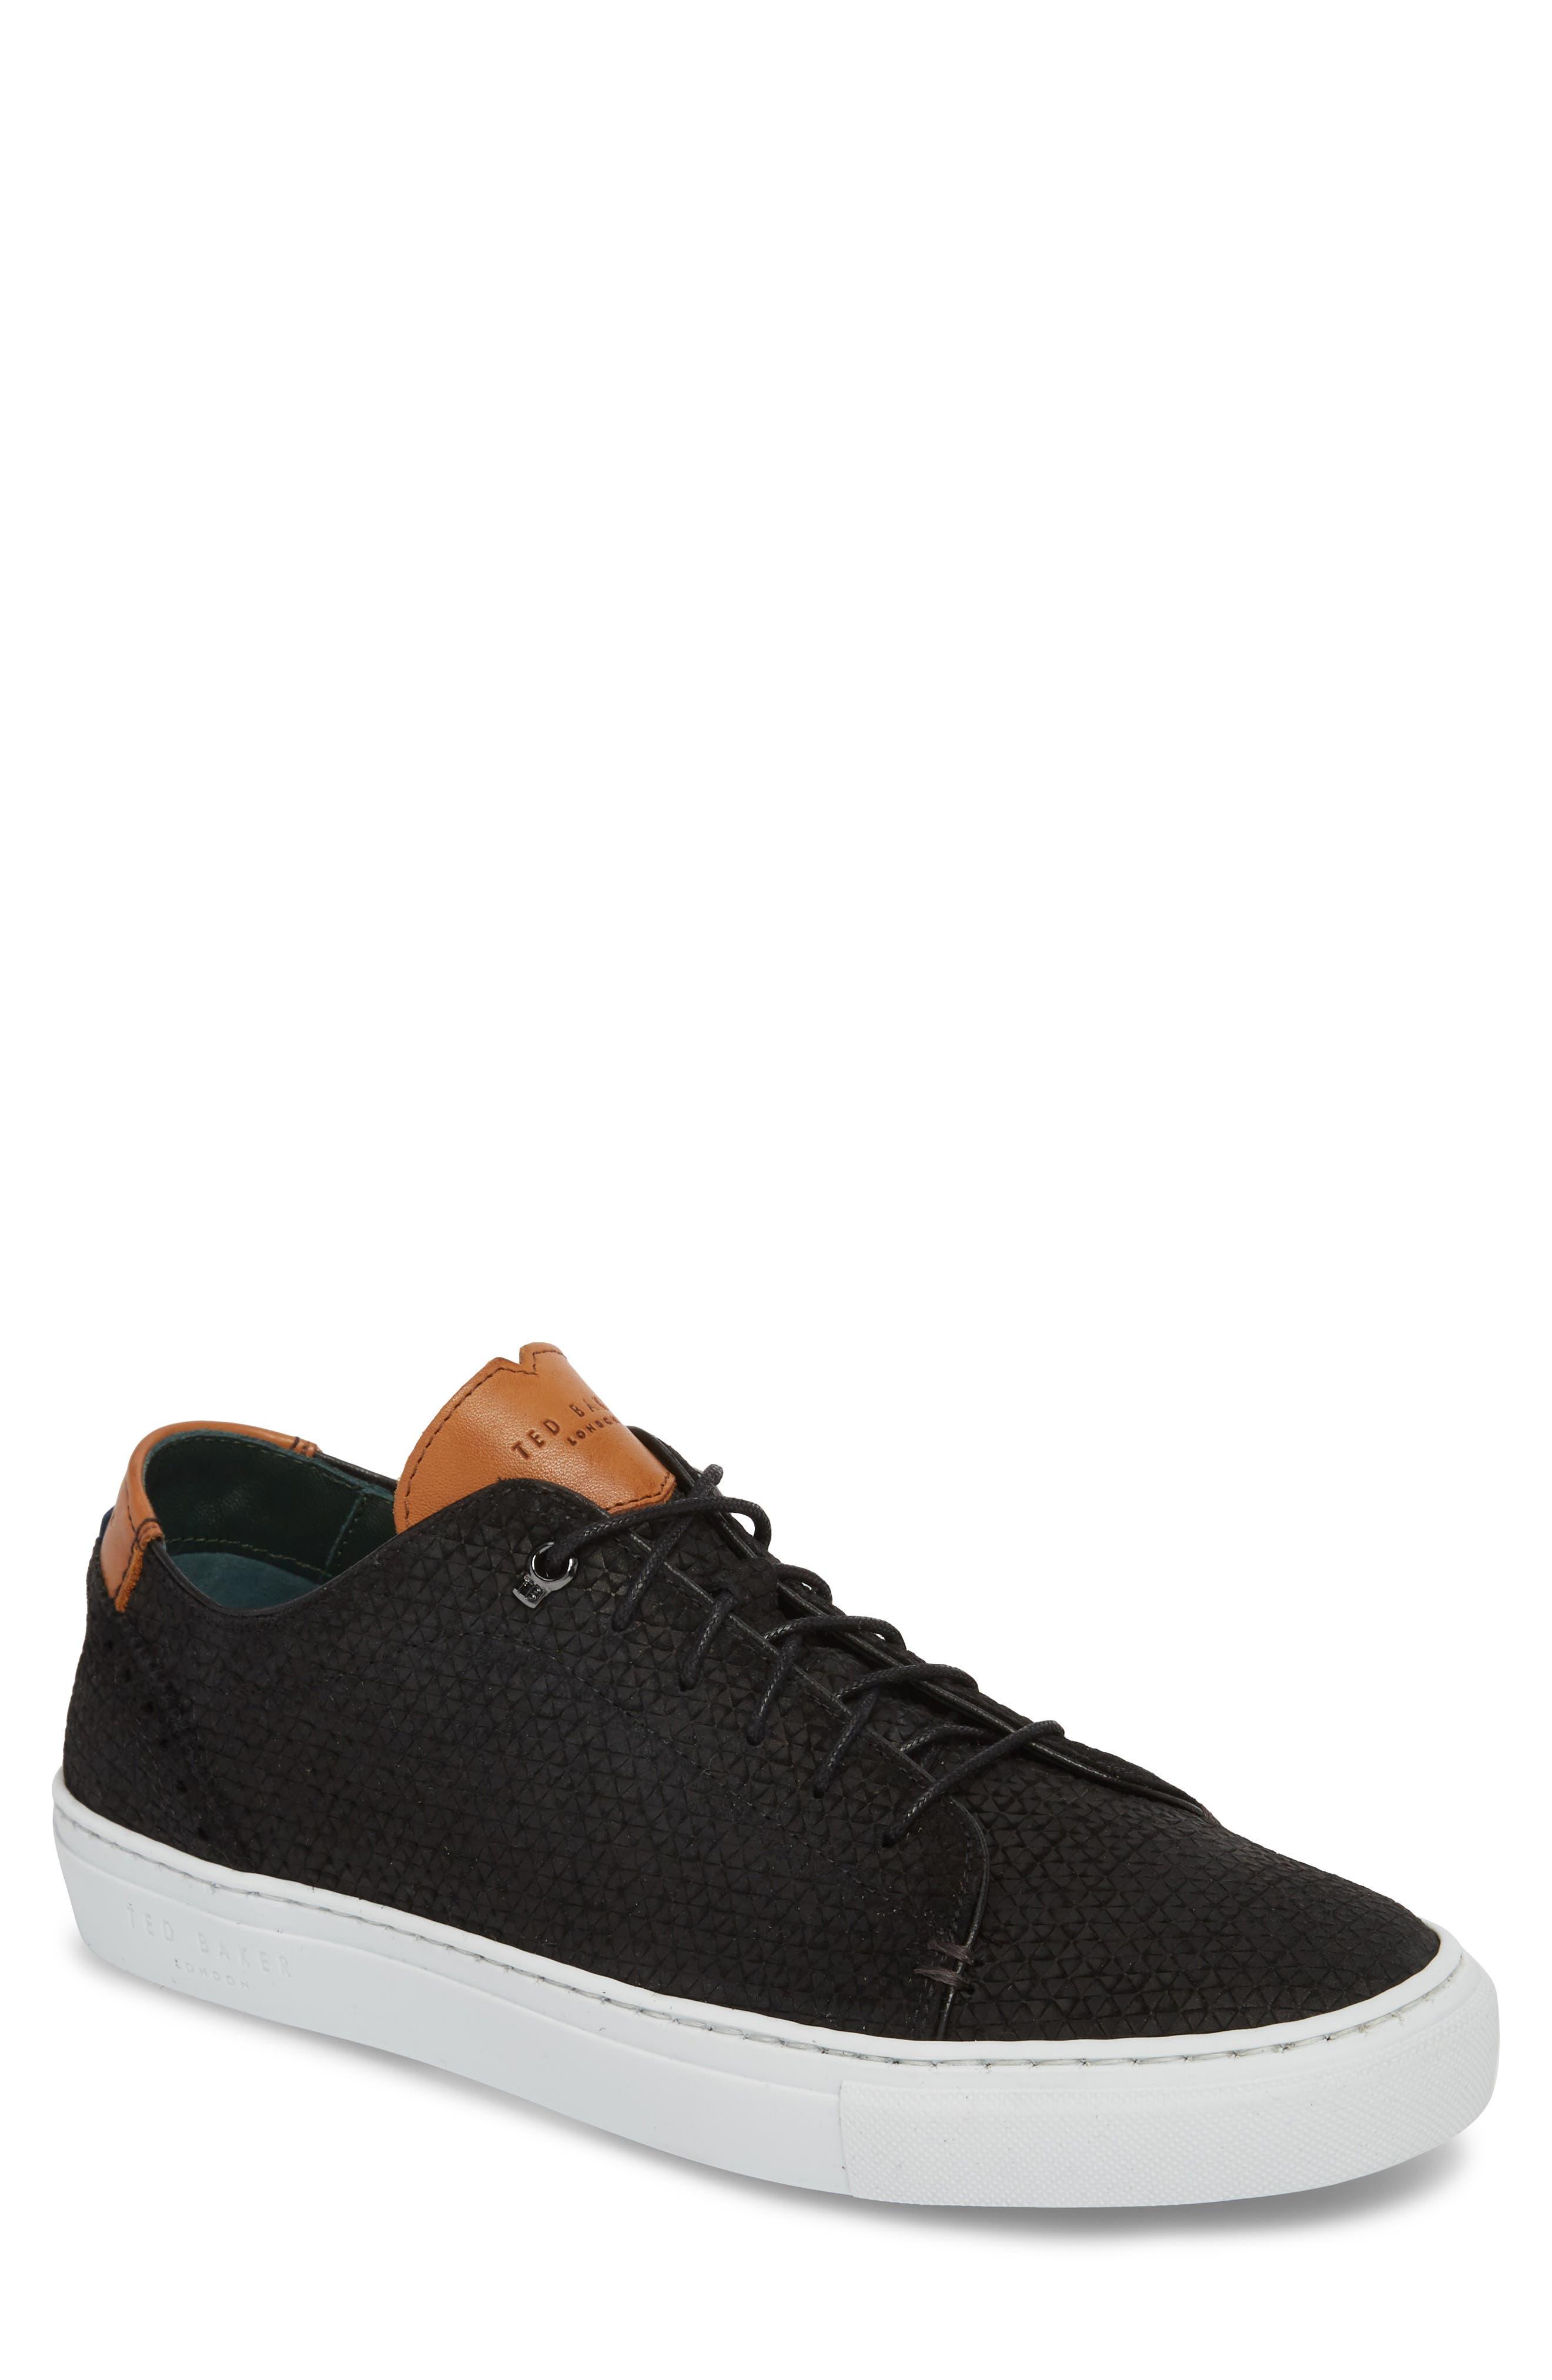 TED BAKER LONDON Duukes Embossed Low Top Sneaker, Main, color, 010